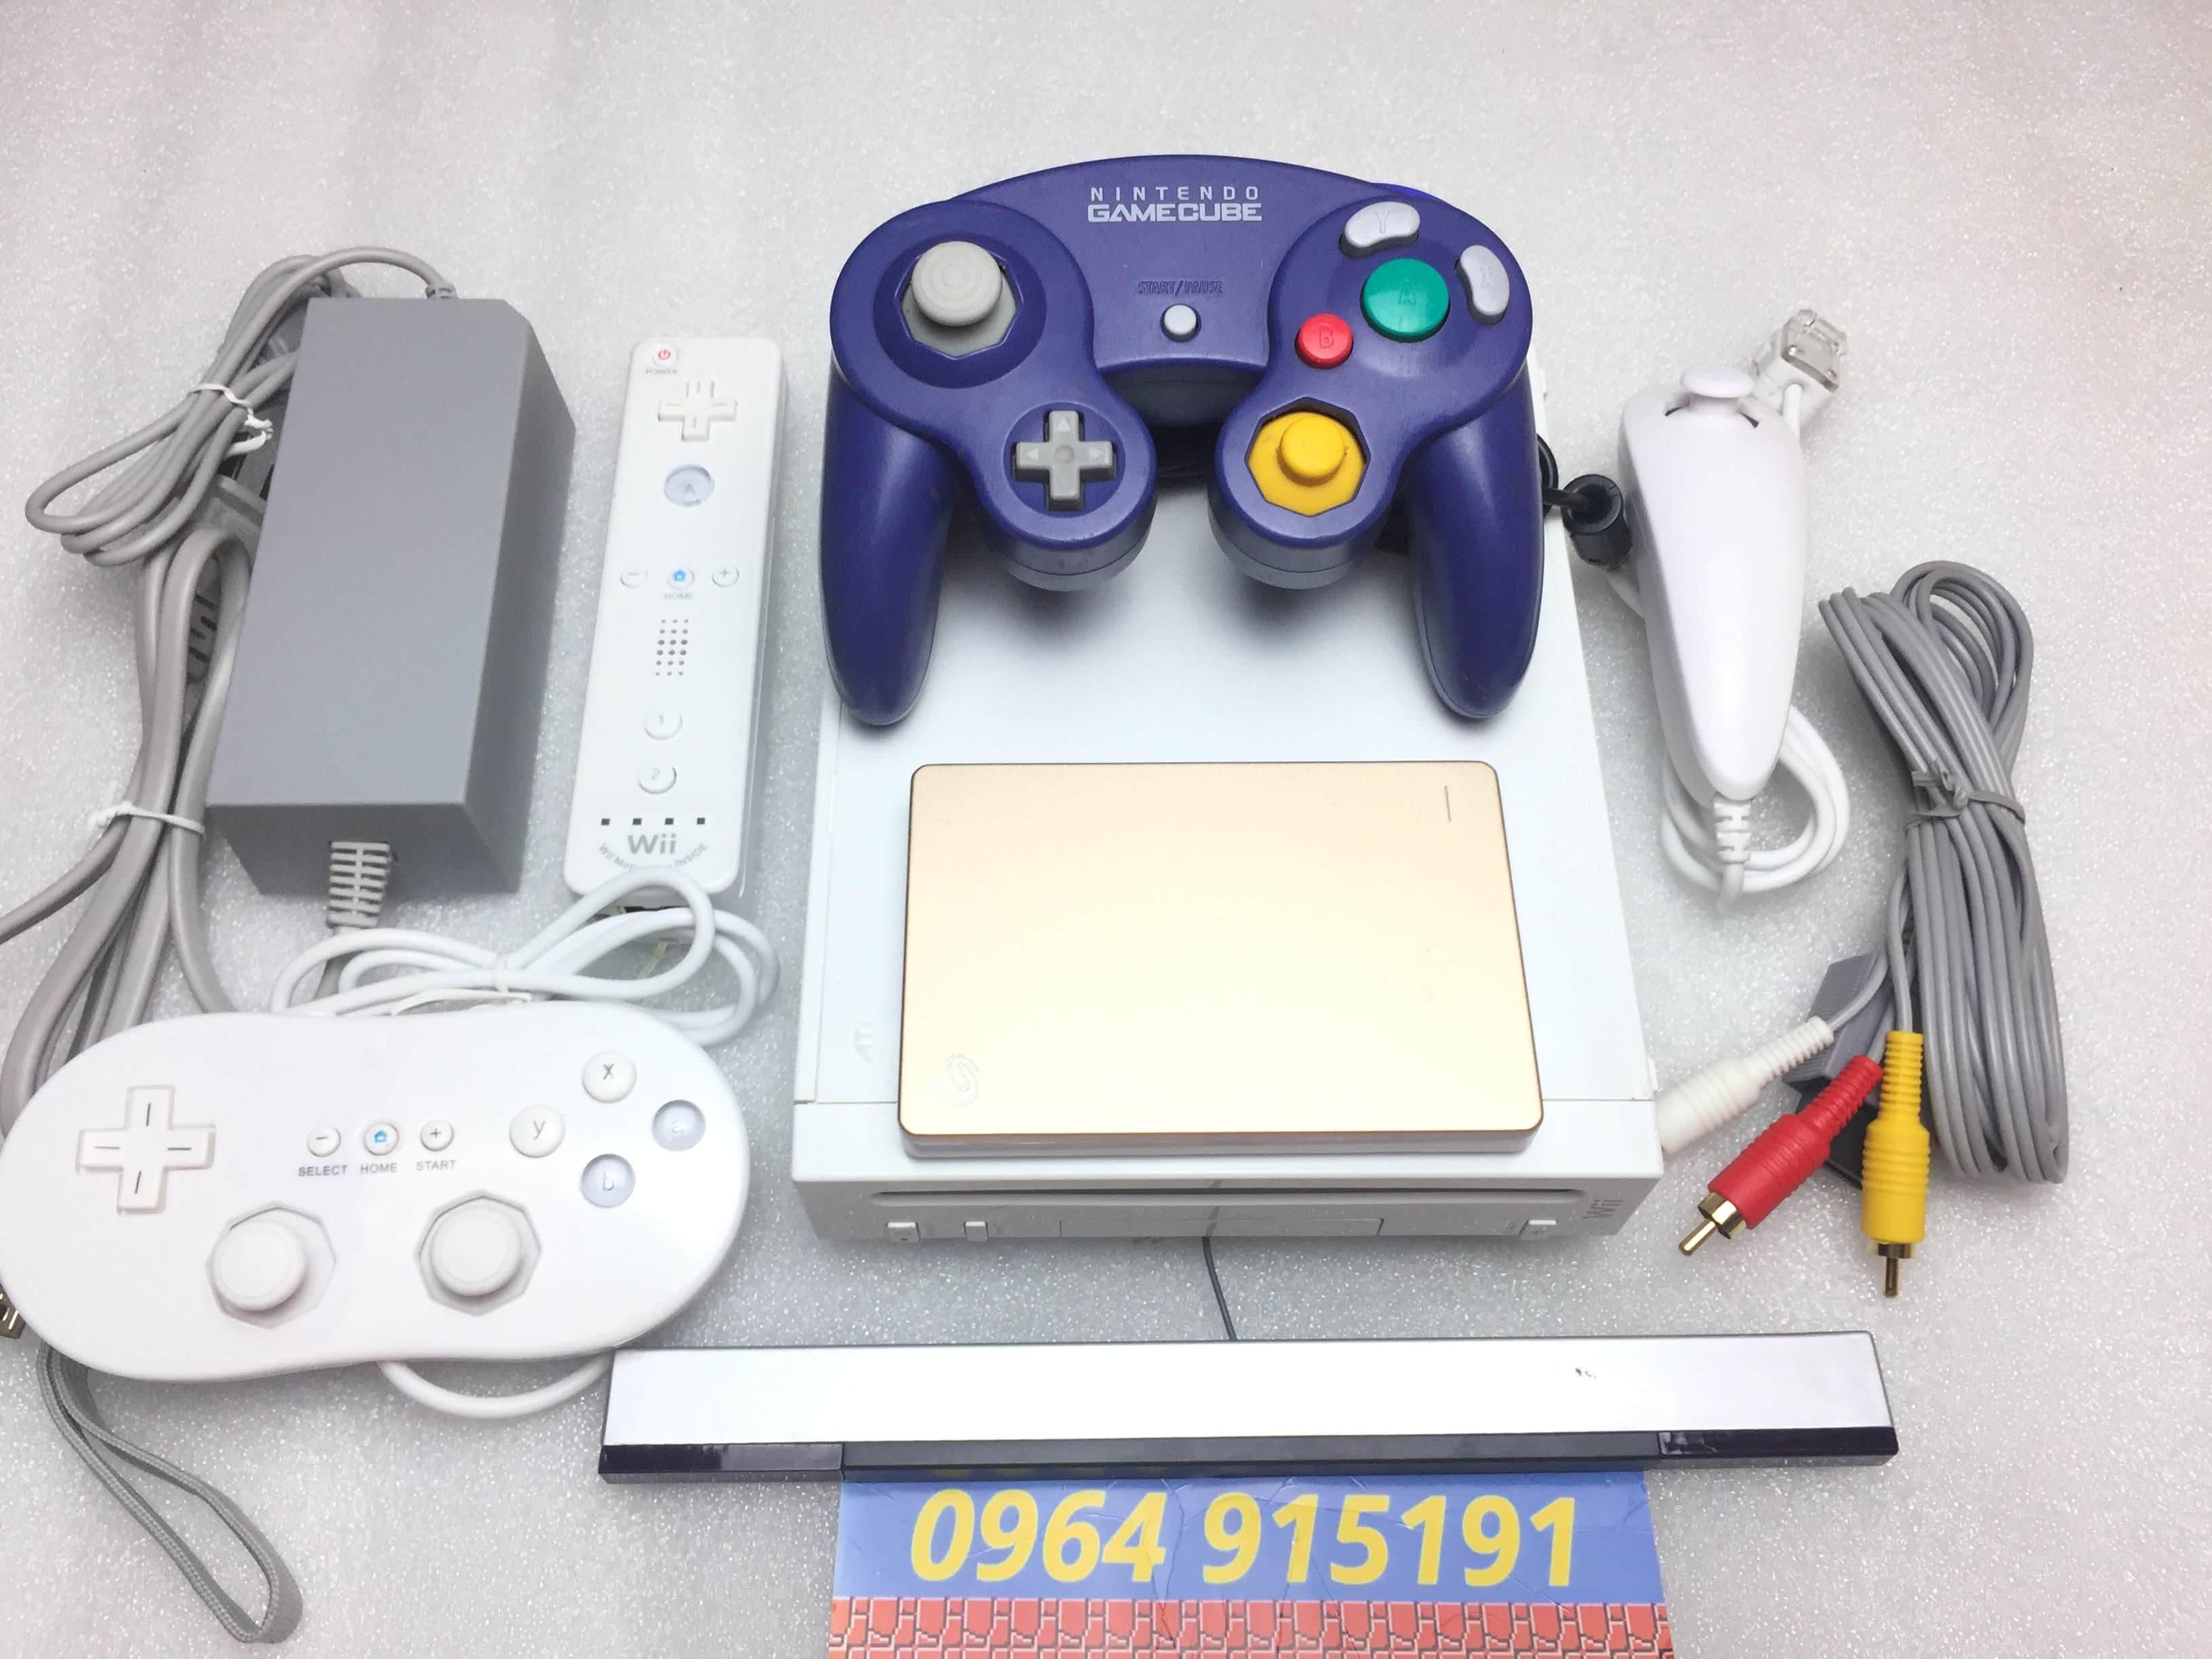 Máy Nitendo Wii Nhật Zin 99% Hack Full SET Super VIP Chứa Hơn 300 Game